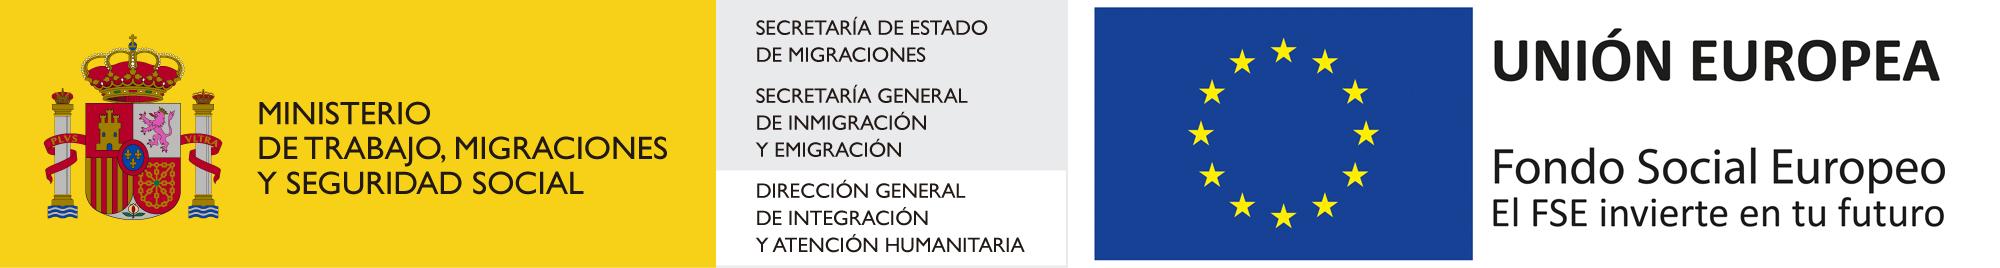 logos_itinerarios_extracom